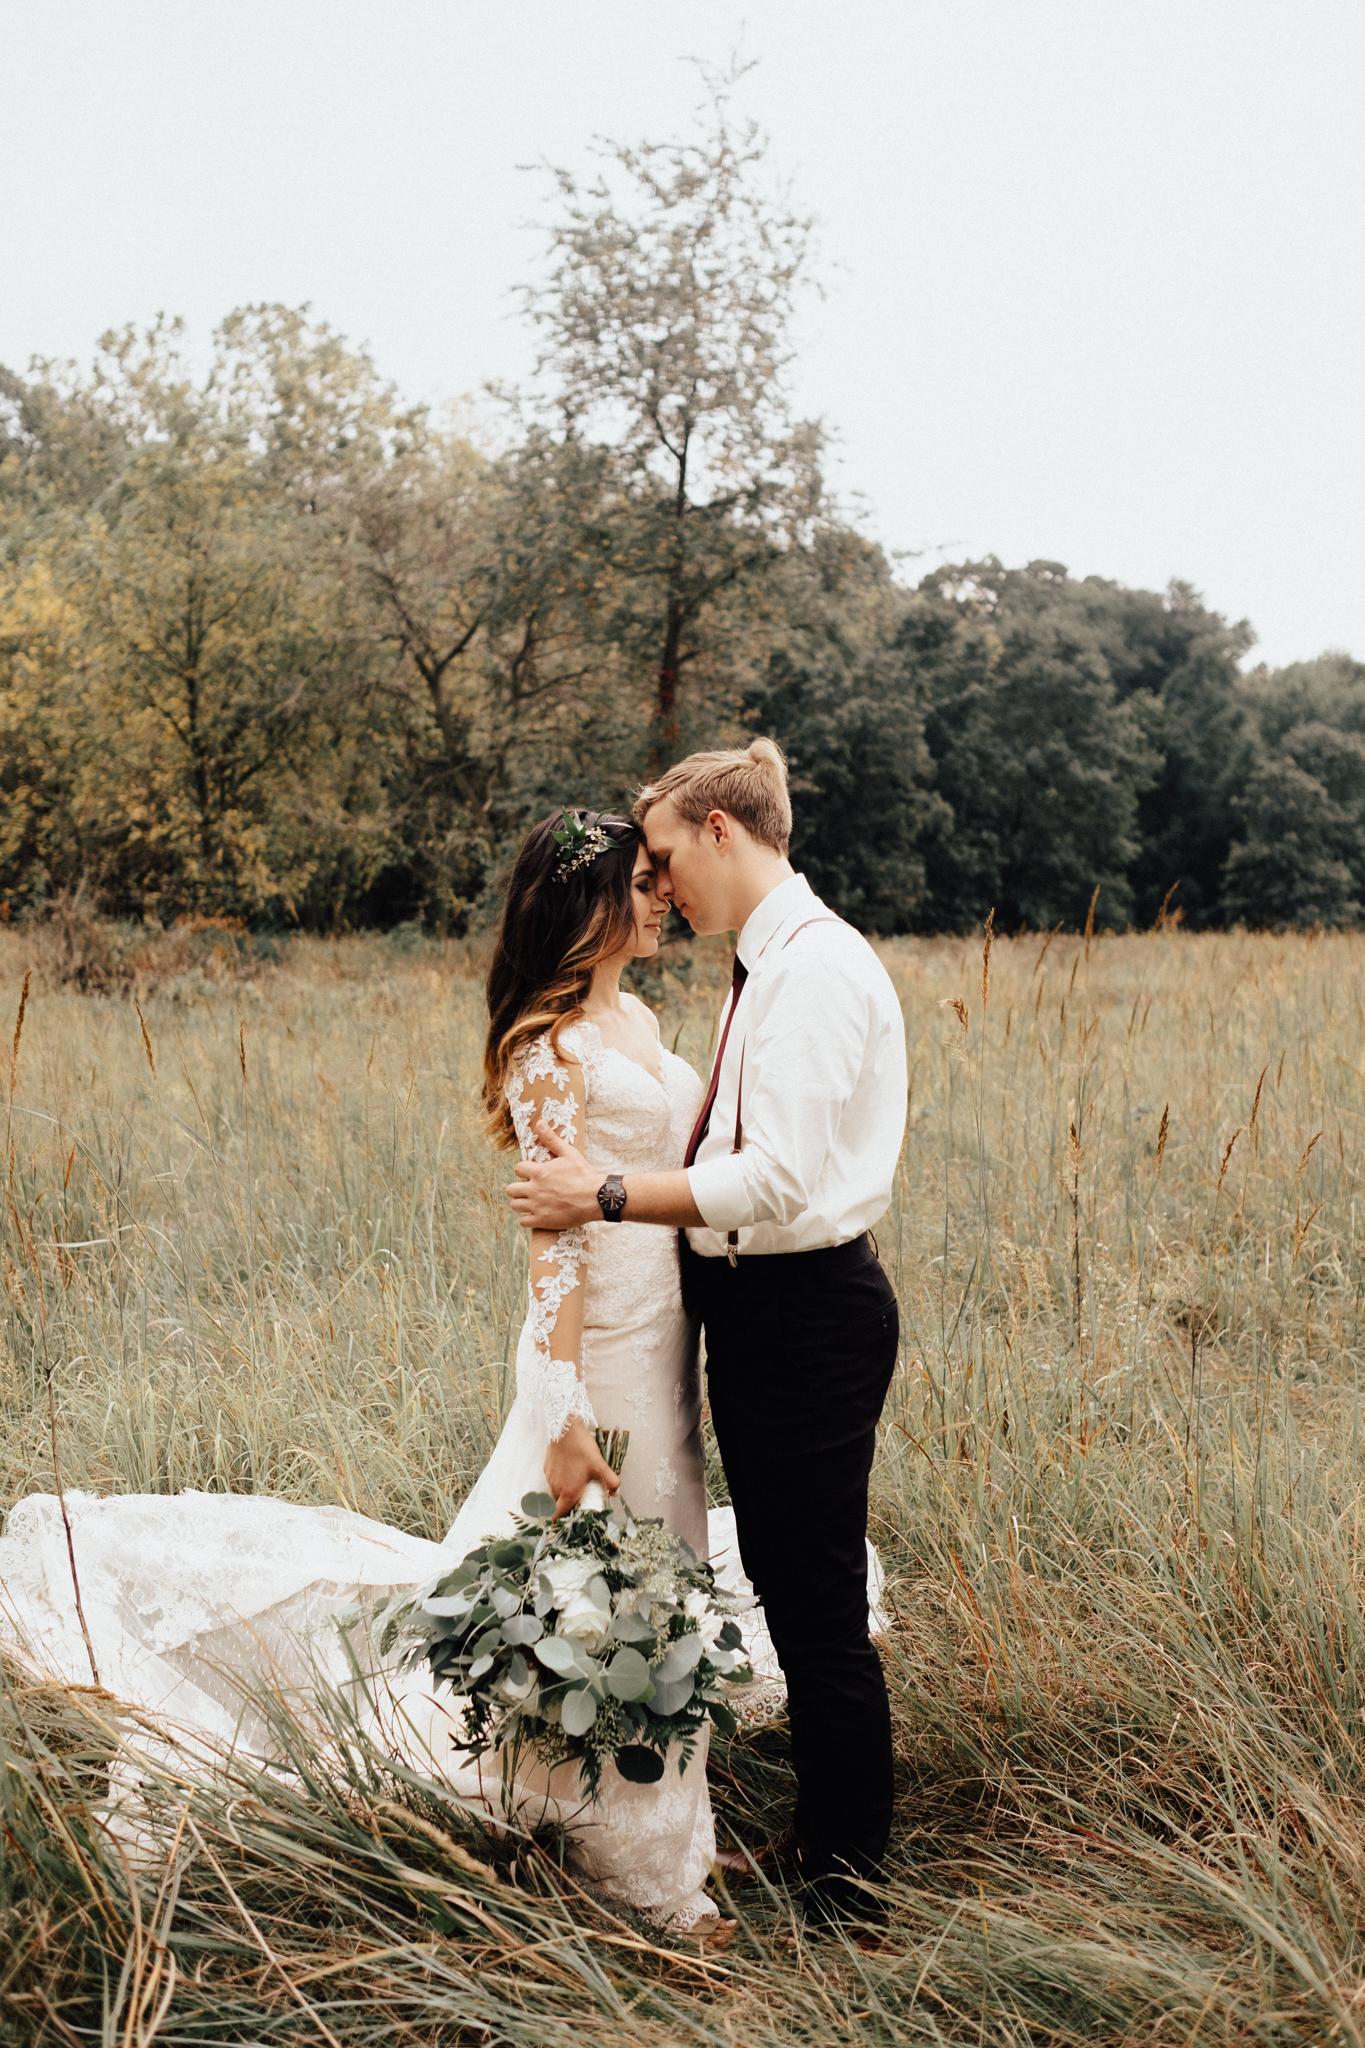 Arizona-Adventure-Elopement-Wedding-Photographer-139.jpg